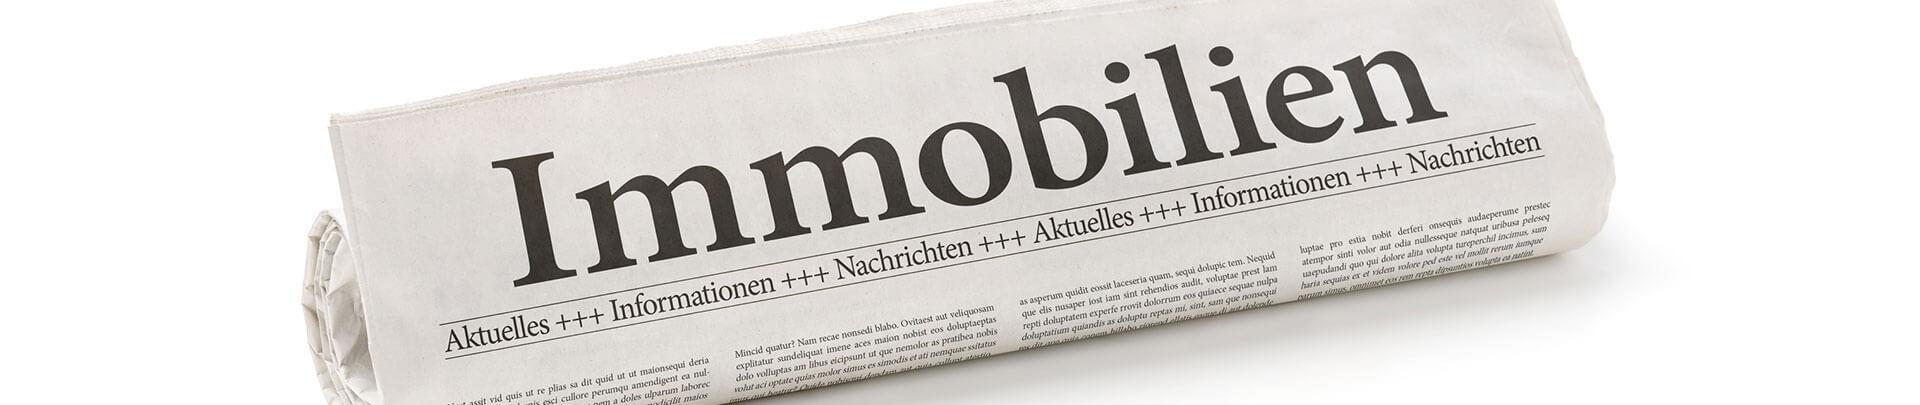 Zeitung Immobilien